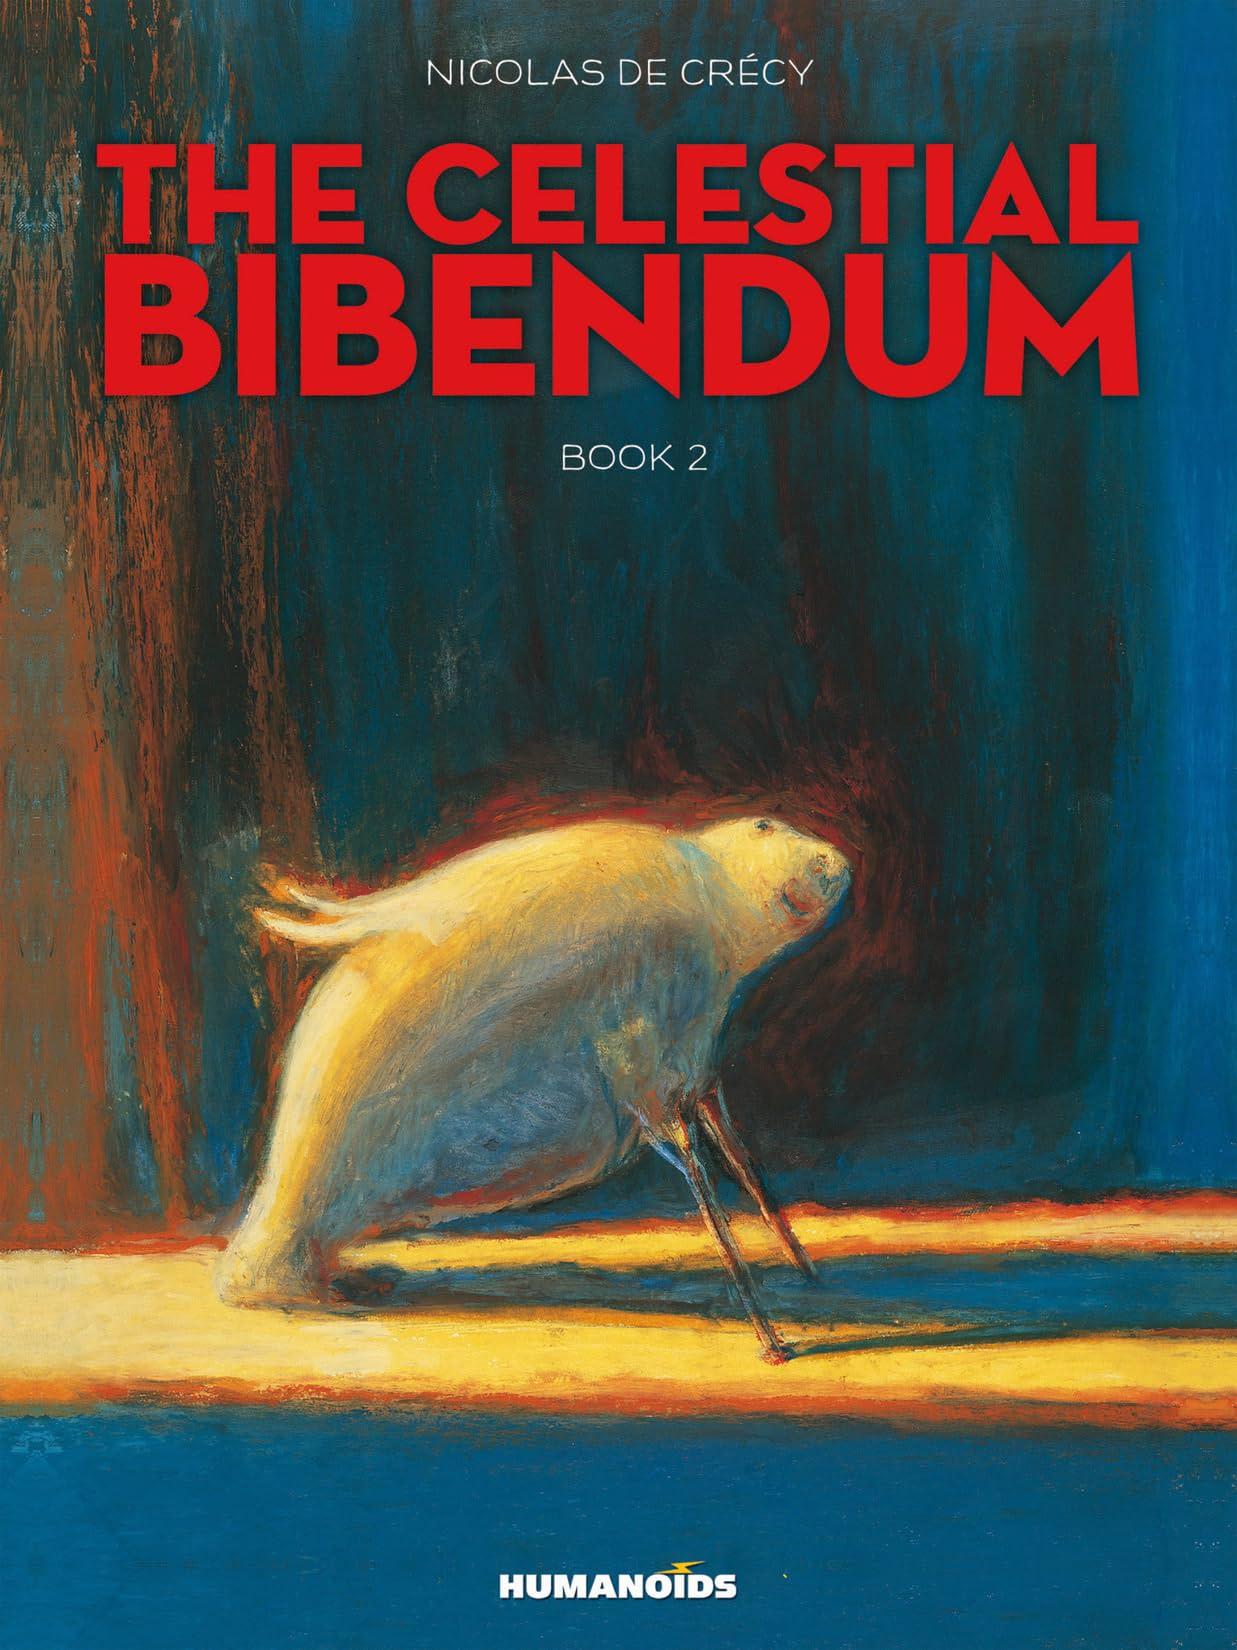 The Celestial Bibendum Vol. 2